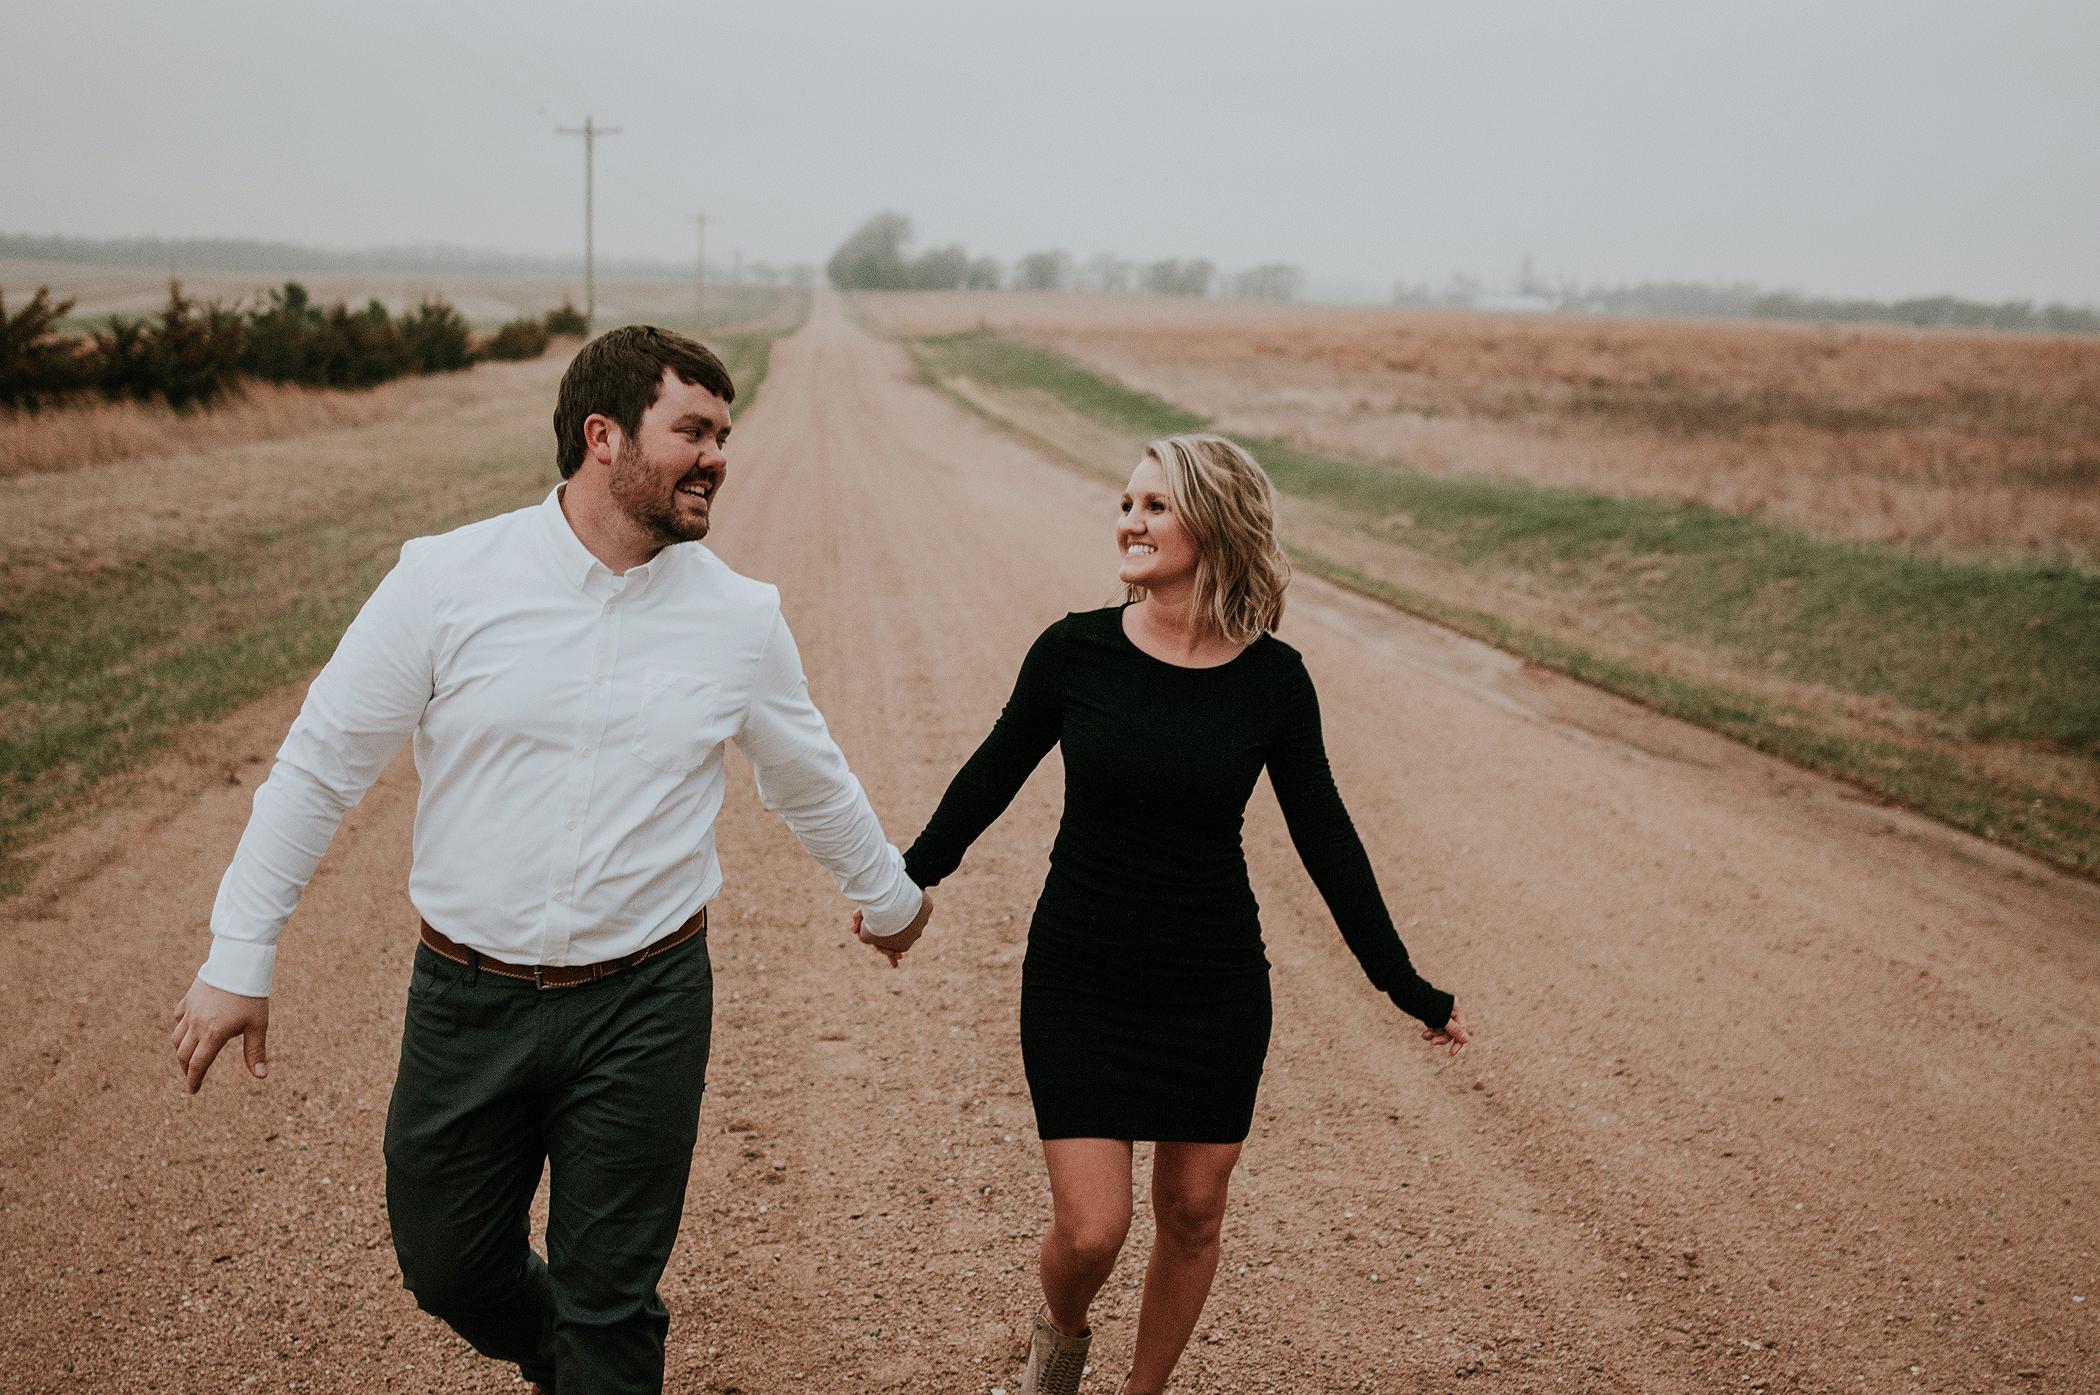 kaylie-sirek-nebraska-wedding-engagement-photographer-photography-grand-island-kearney-hastings-lincoln-31.png